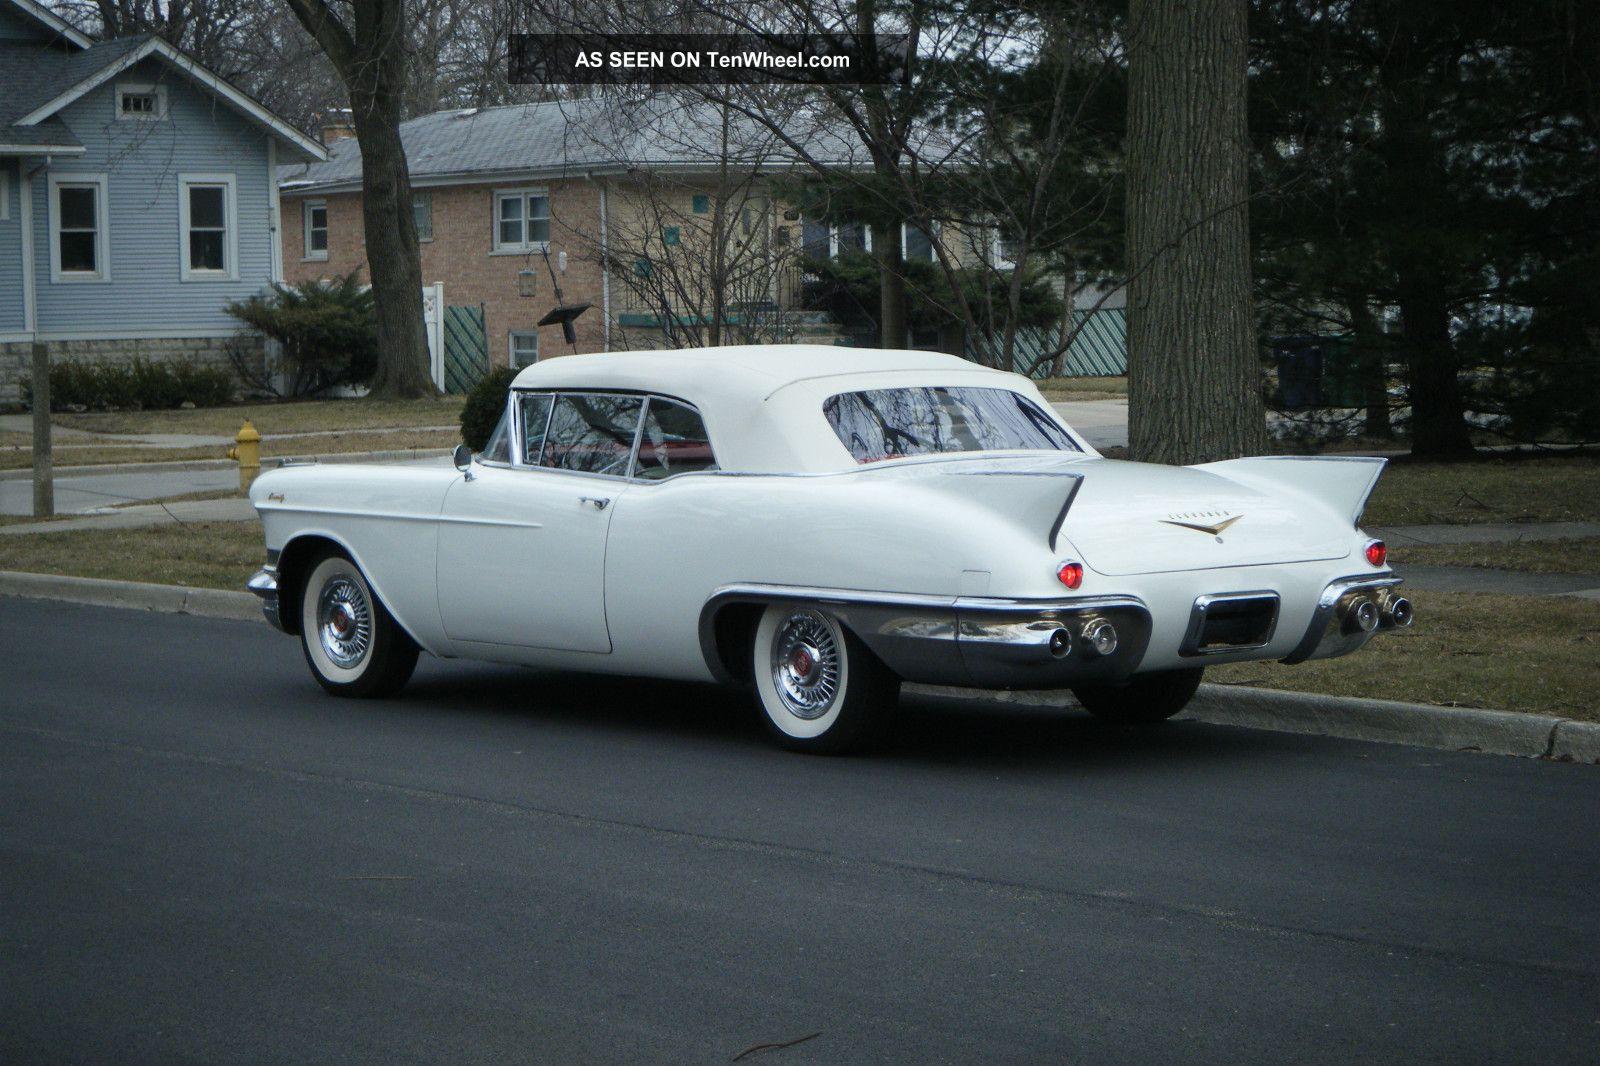 1957 cadillac eldorado convertible factory air eldorado photo. Cars Review. Best American Auto & Cars Review